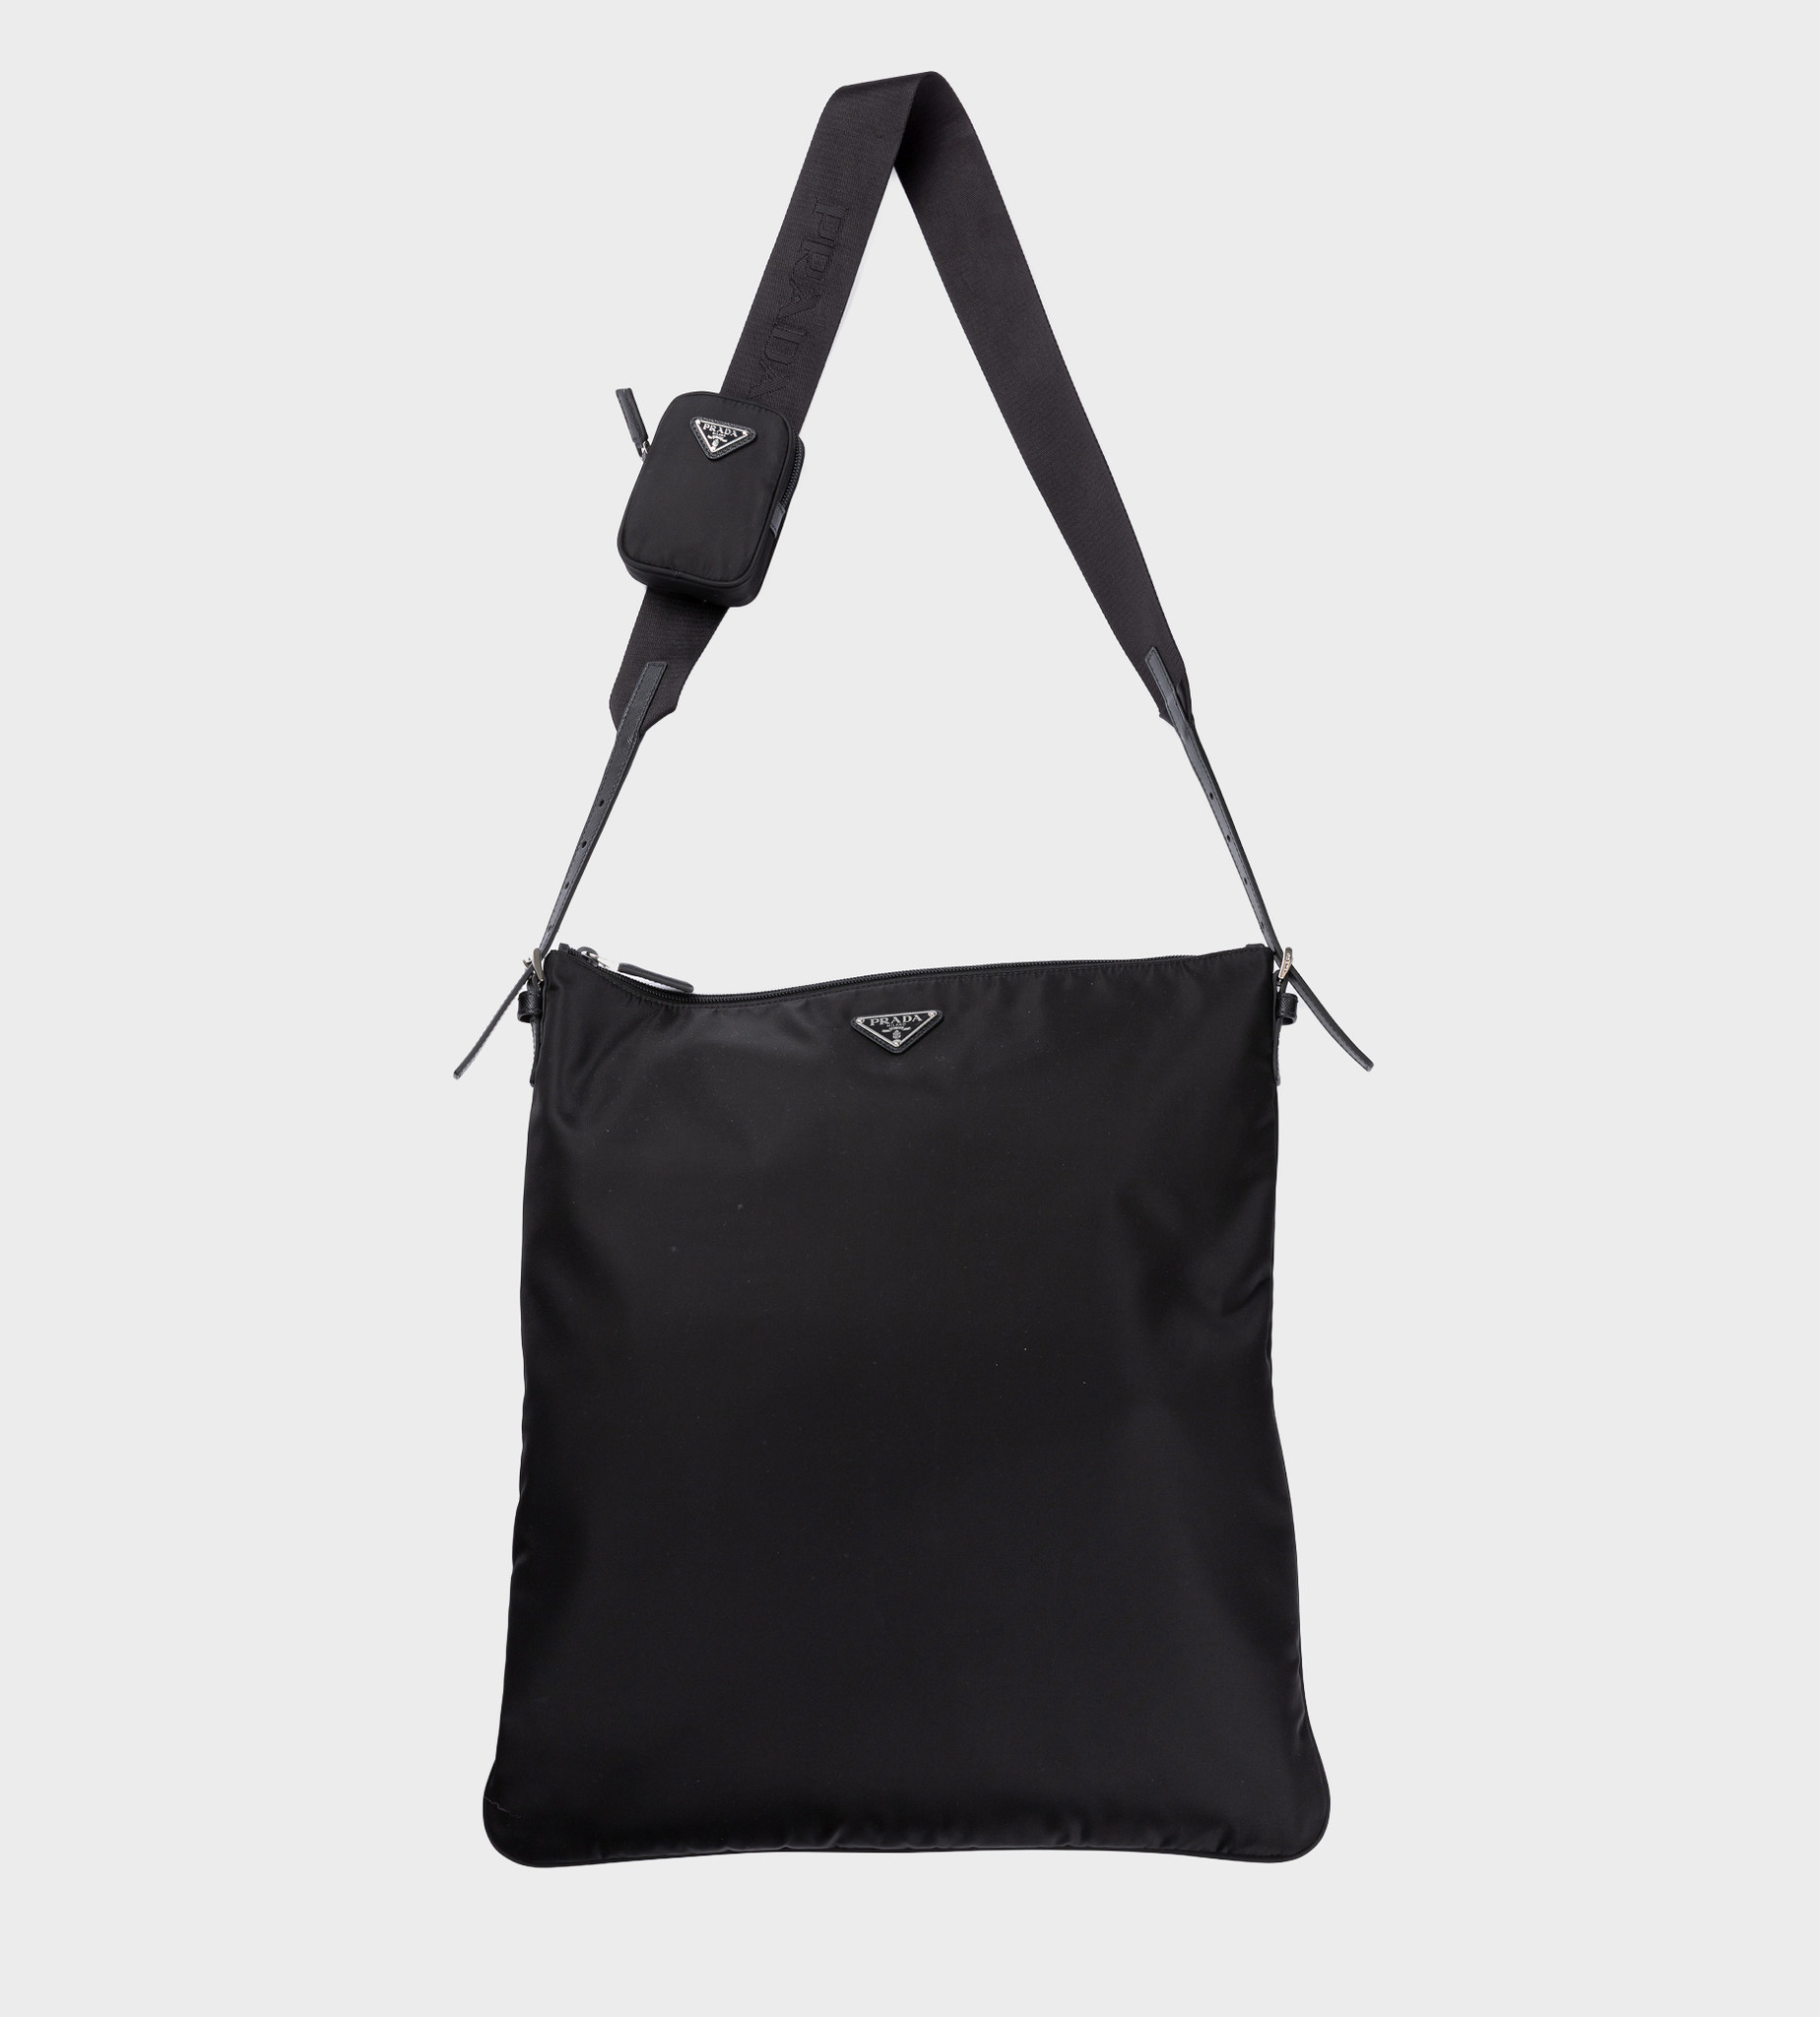 PRADA Re-Nylon Saffiano Leather Shoulder Bag Black